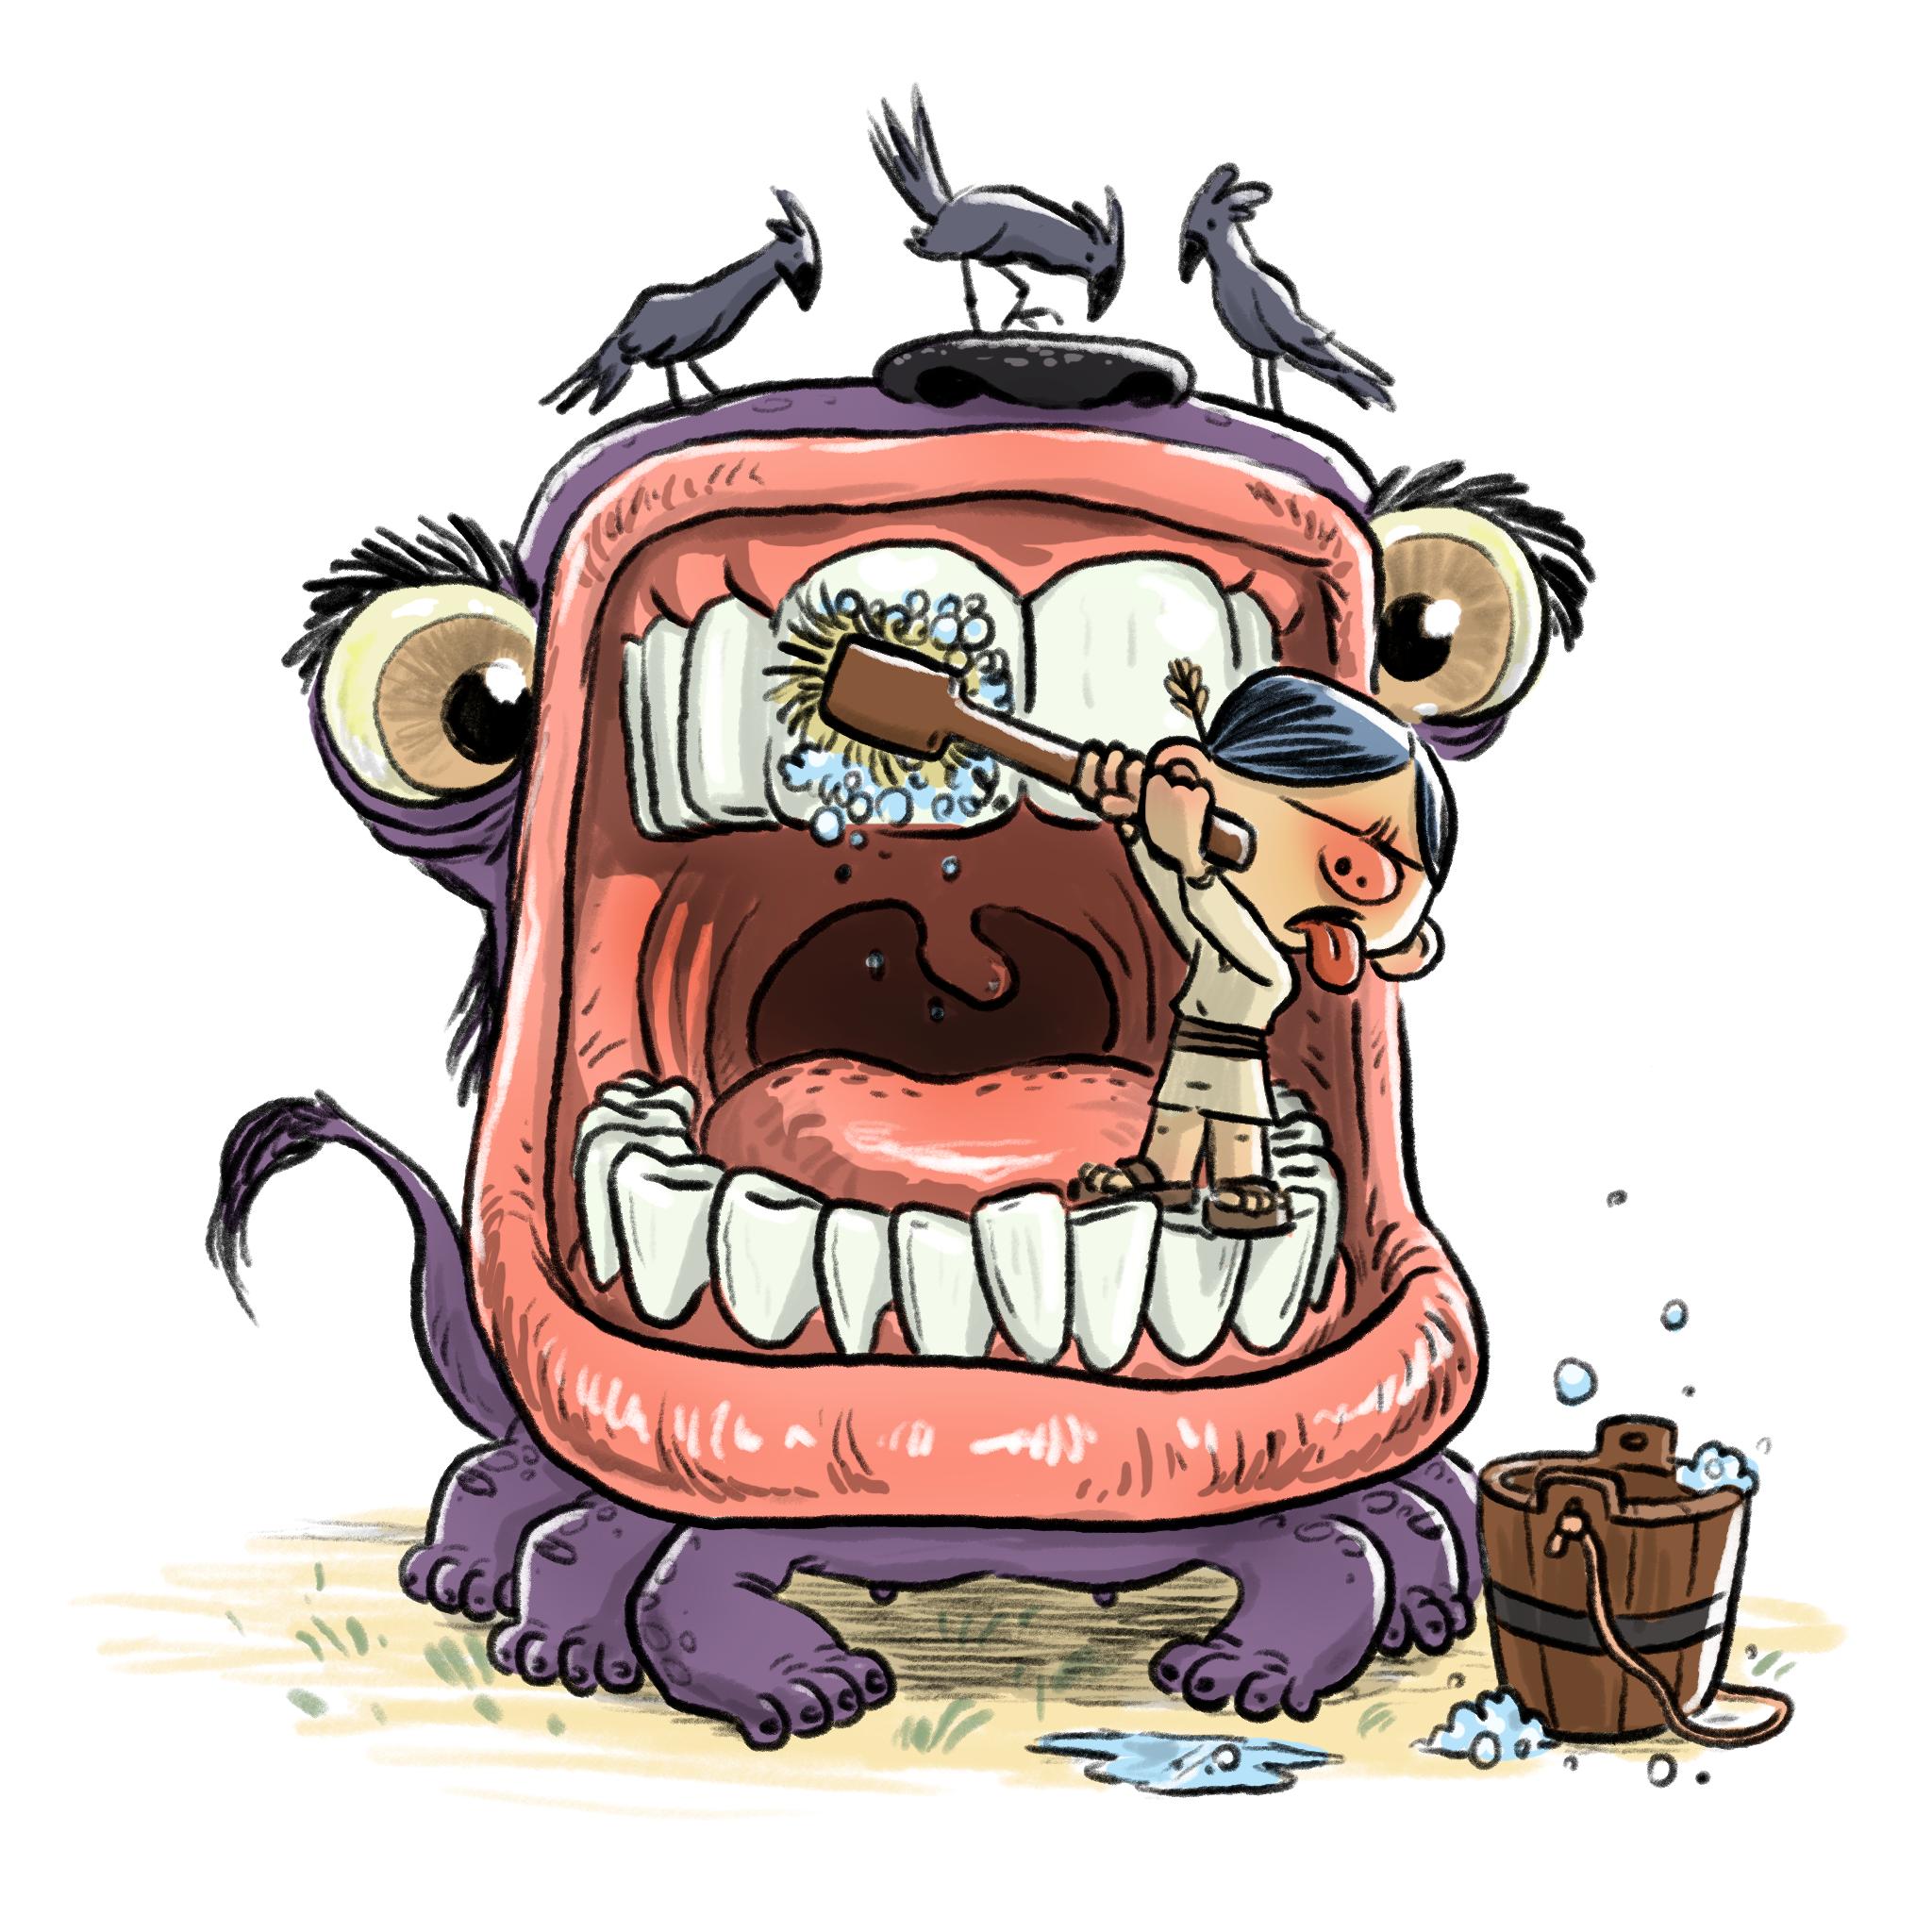 Avoidicus teethicus